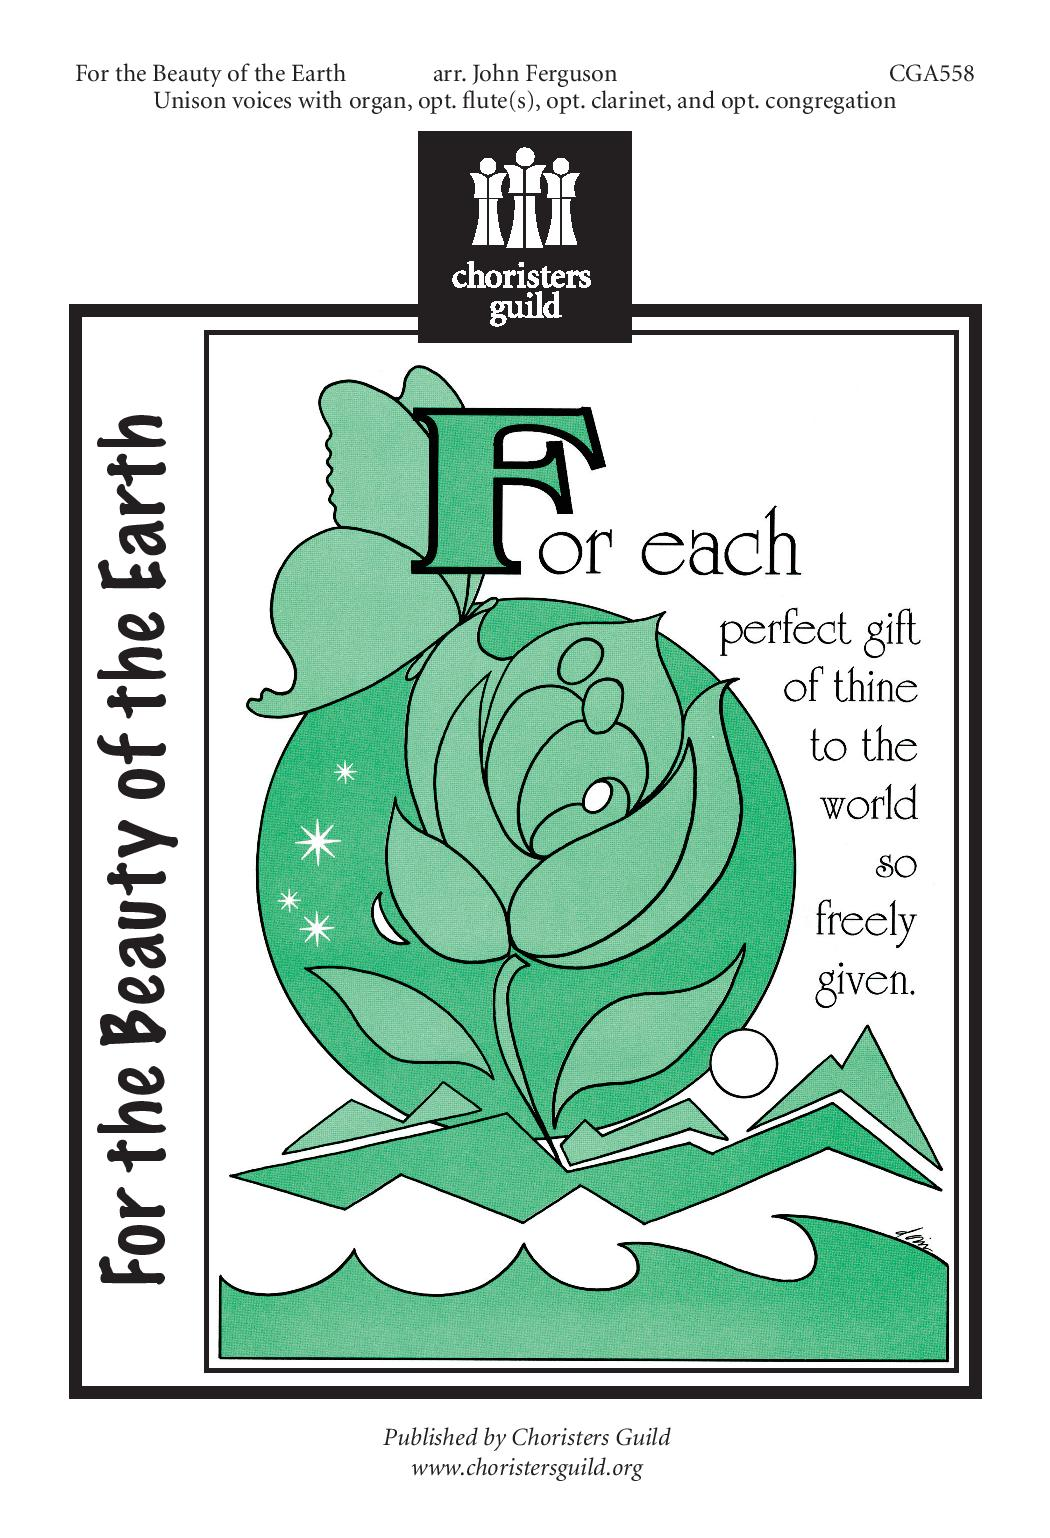 For the Beauty of the Earth arr Ferguson